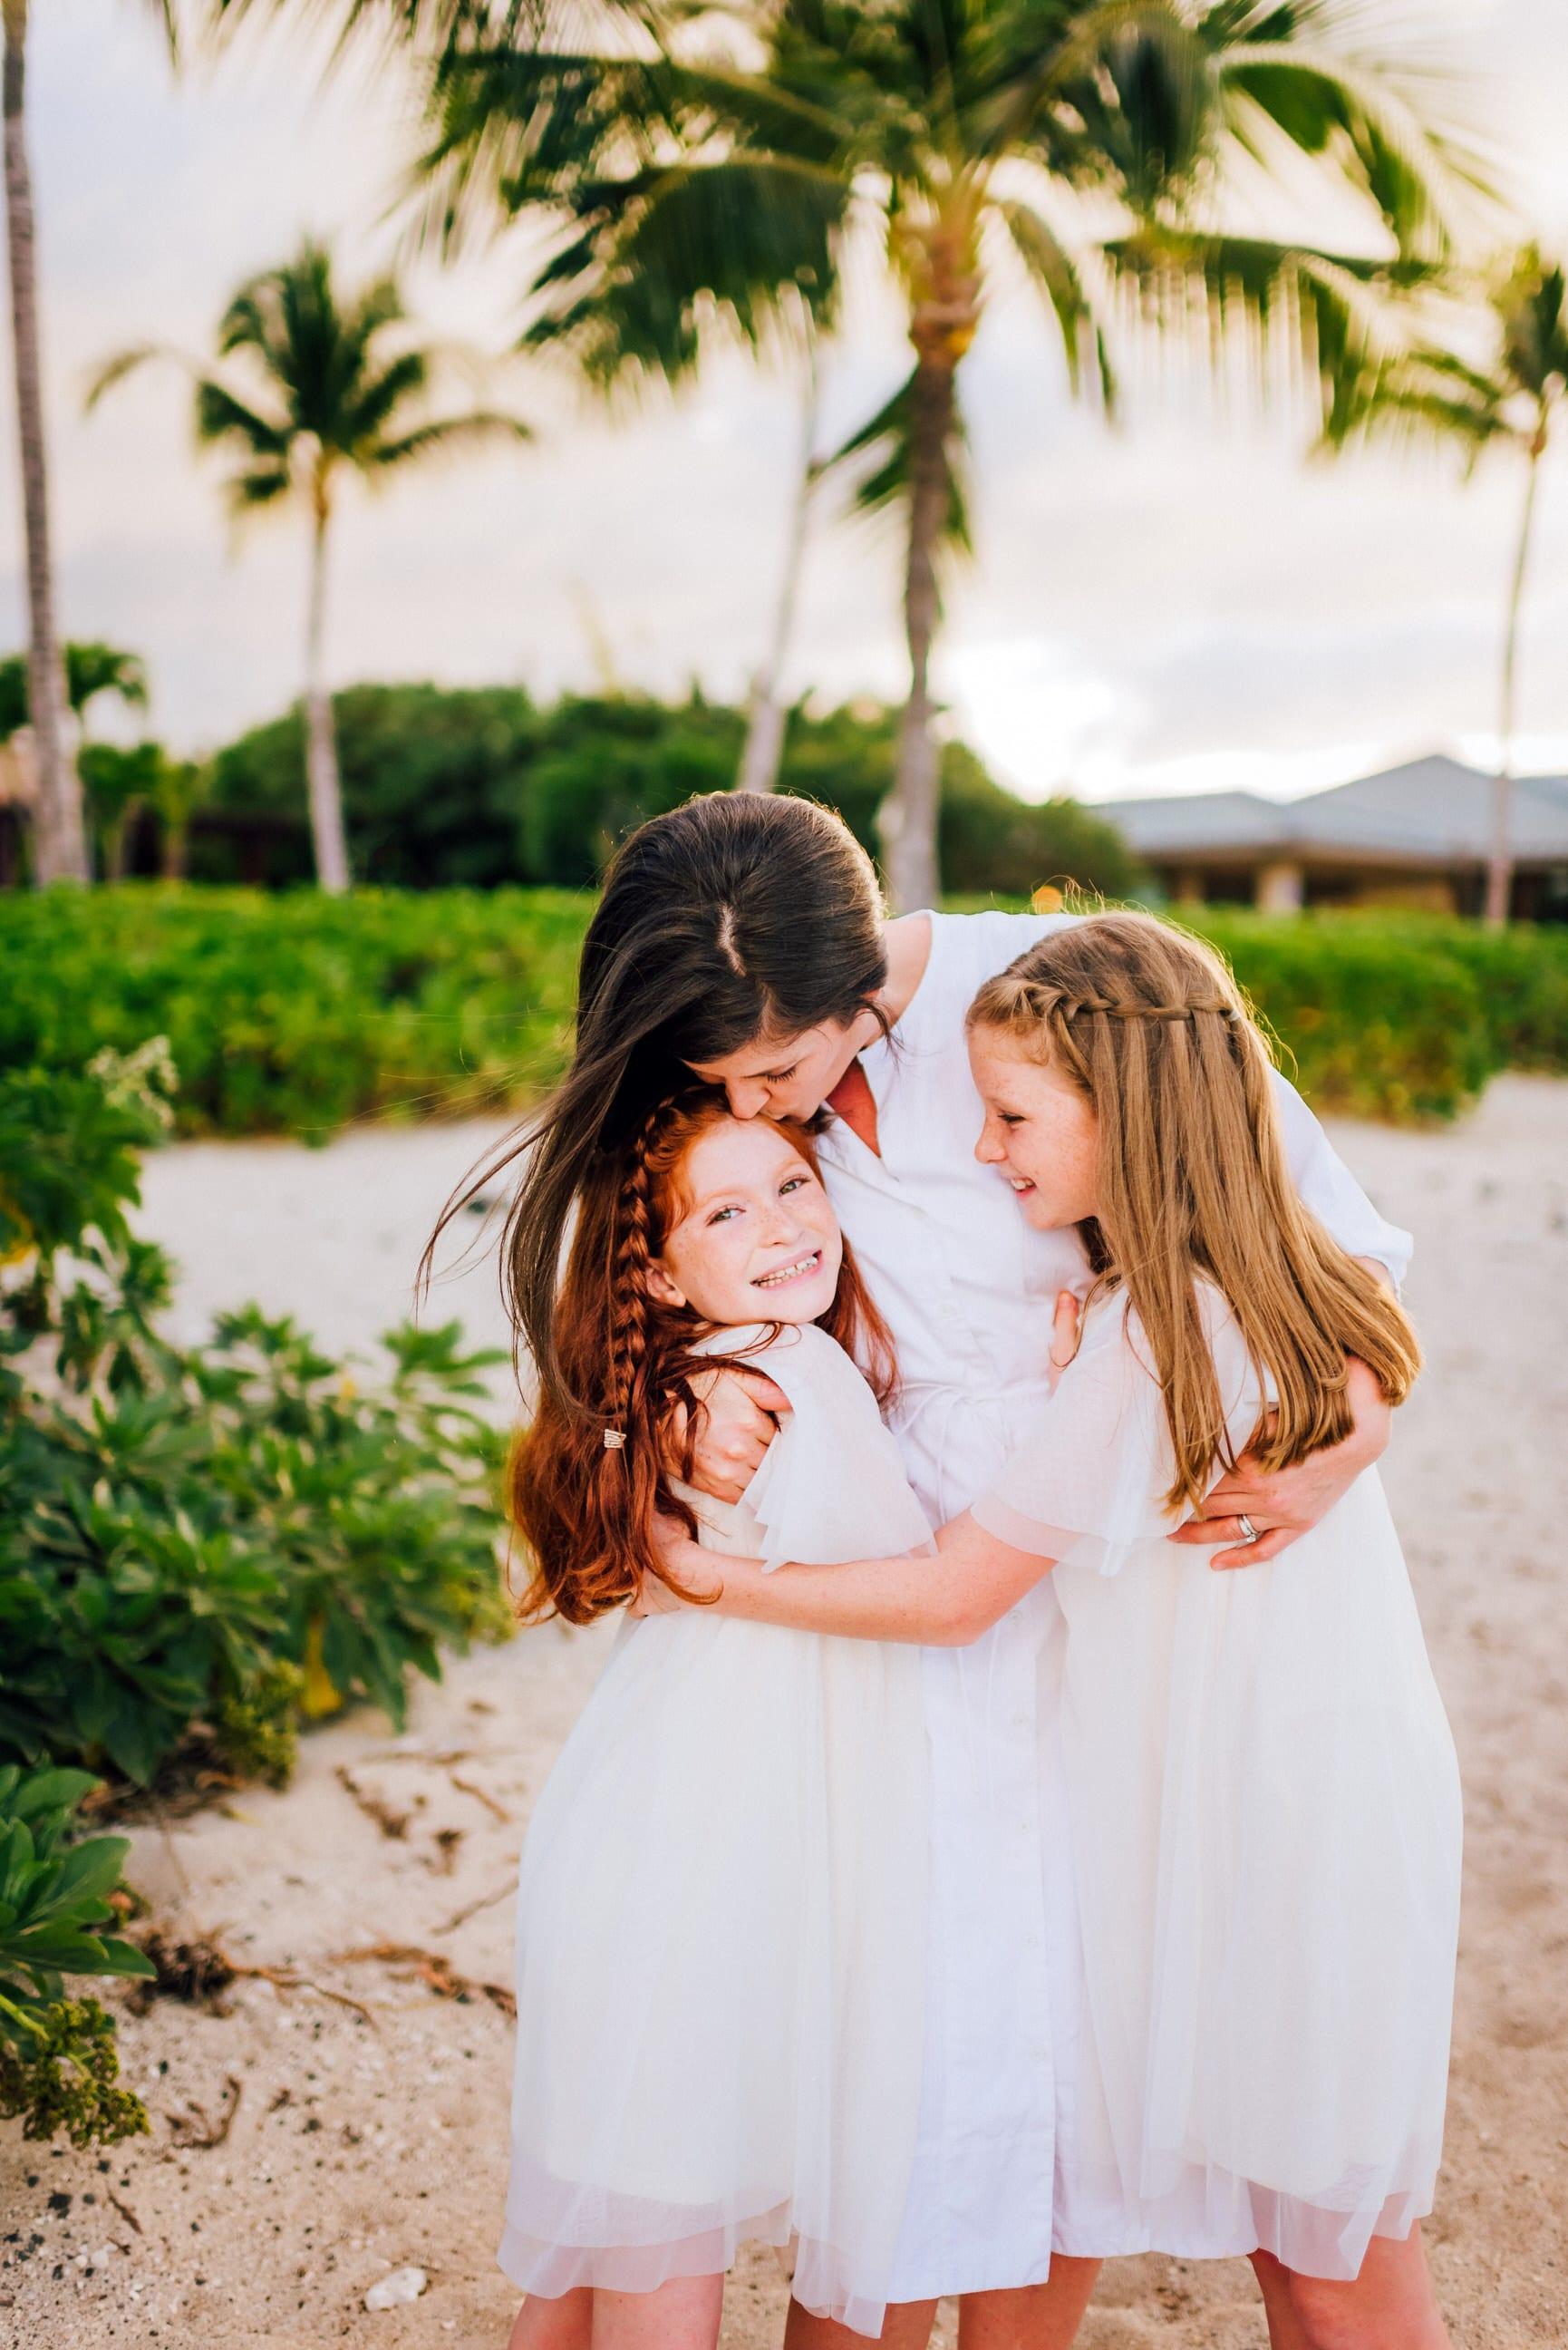 Hawaii-Family-Photographer-Waikoloa-Fairmont-Hualalai-Mauna-Kea-10.jpg